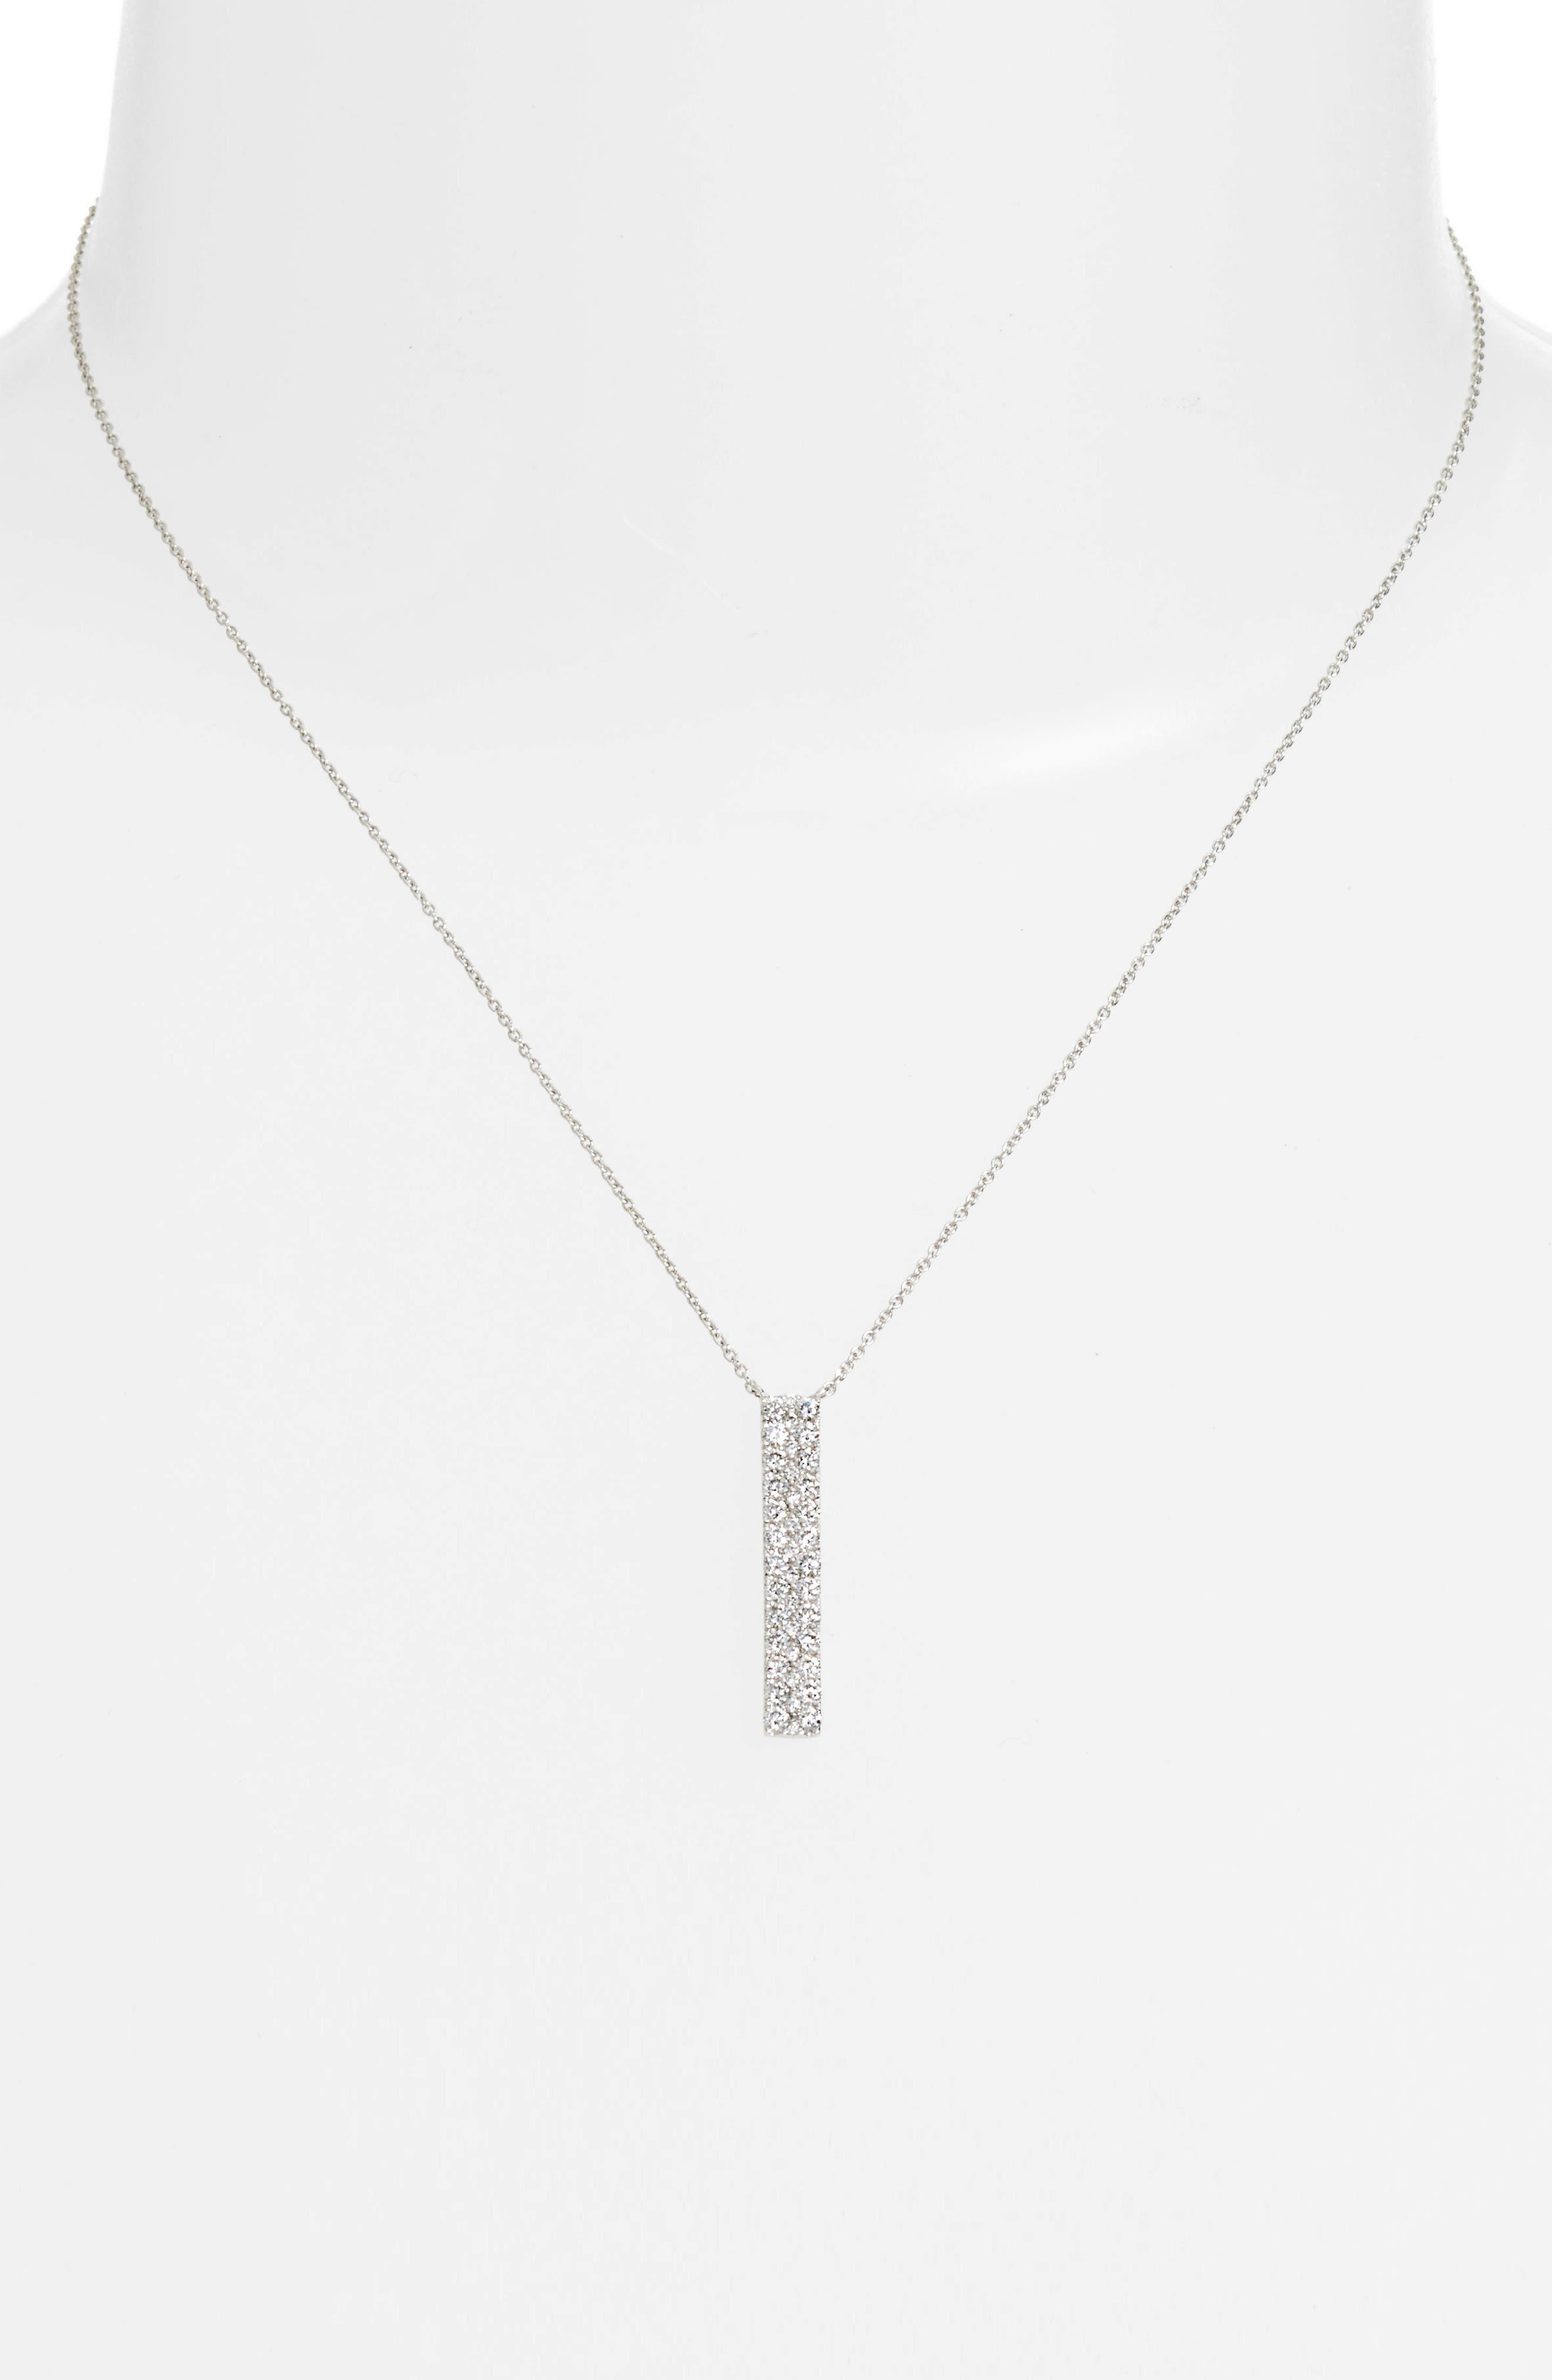 Main Image - Bony Levy Kiera Diamond Bar Pendant Necklace (Nordstrom Exclusive)